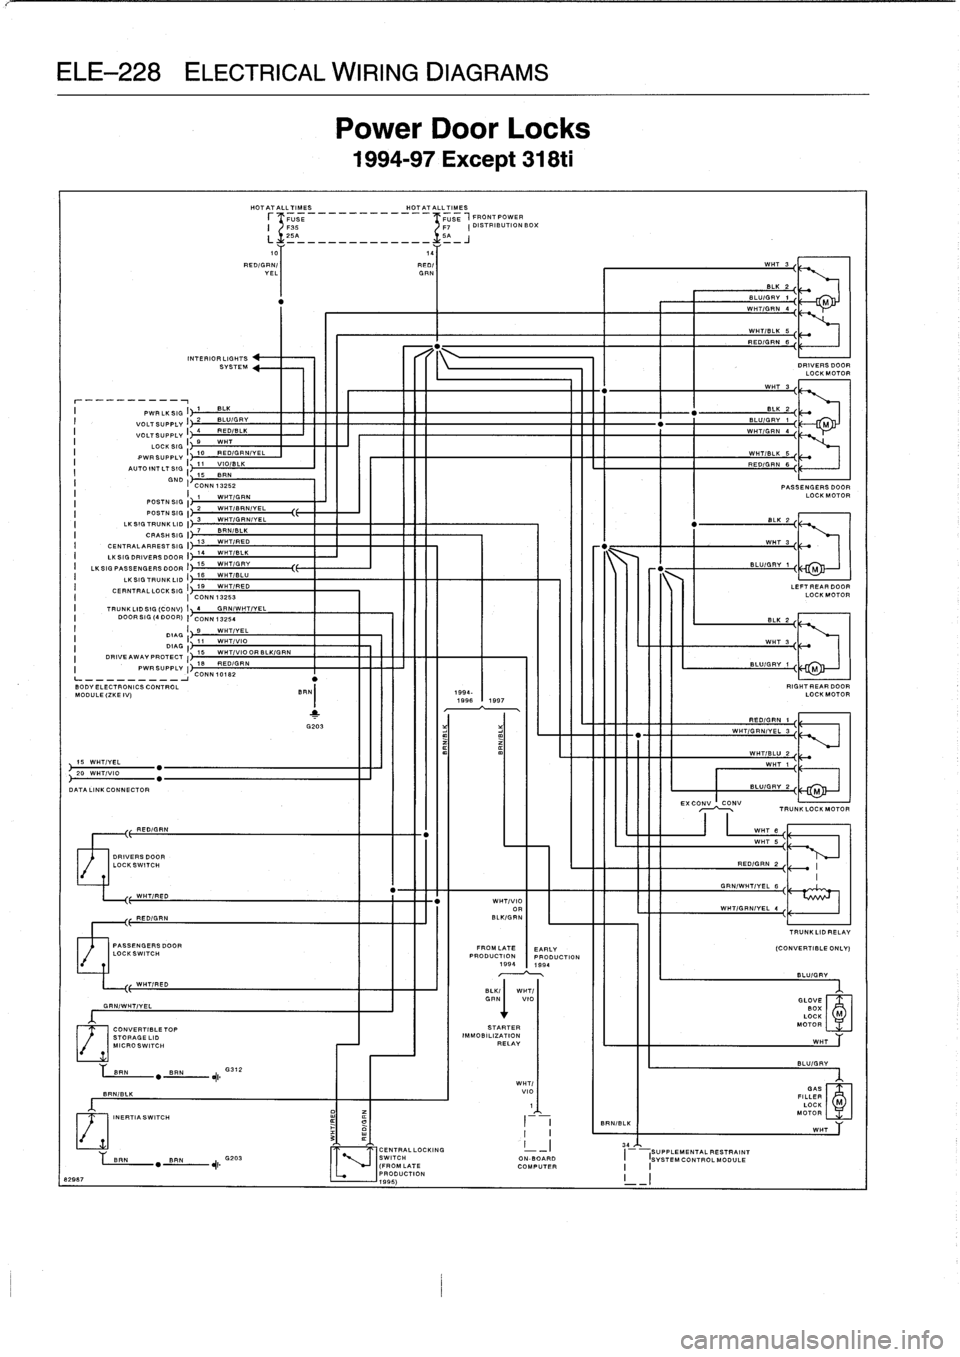 1999 Bmw 540i Diagram Engine Control Wiring Fuse Library Rh 76 Skriptoase De 528i Parts